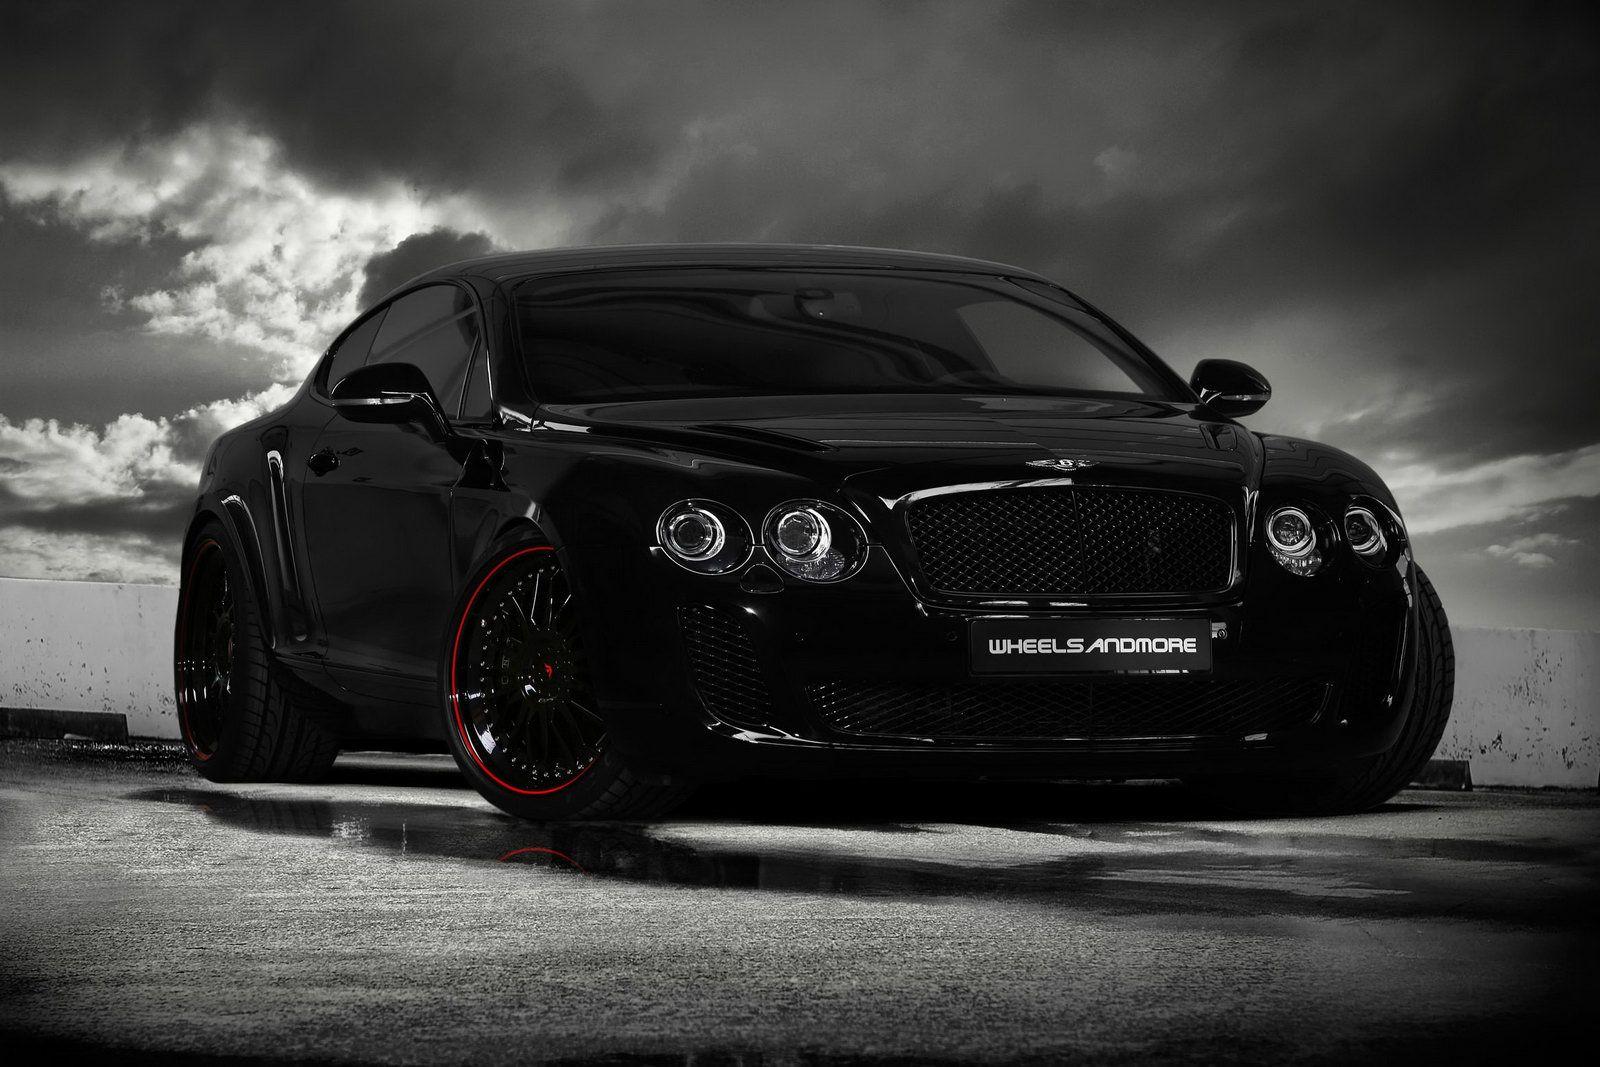 Bentley Continental GT Ultrasports Hd Wallpaper